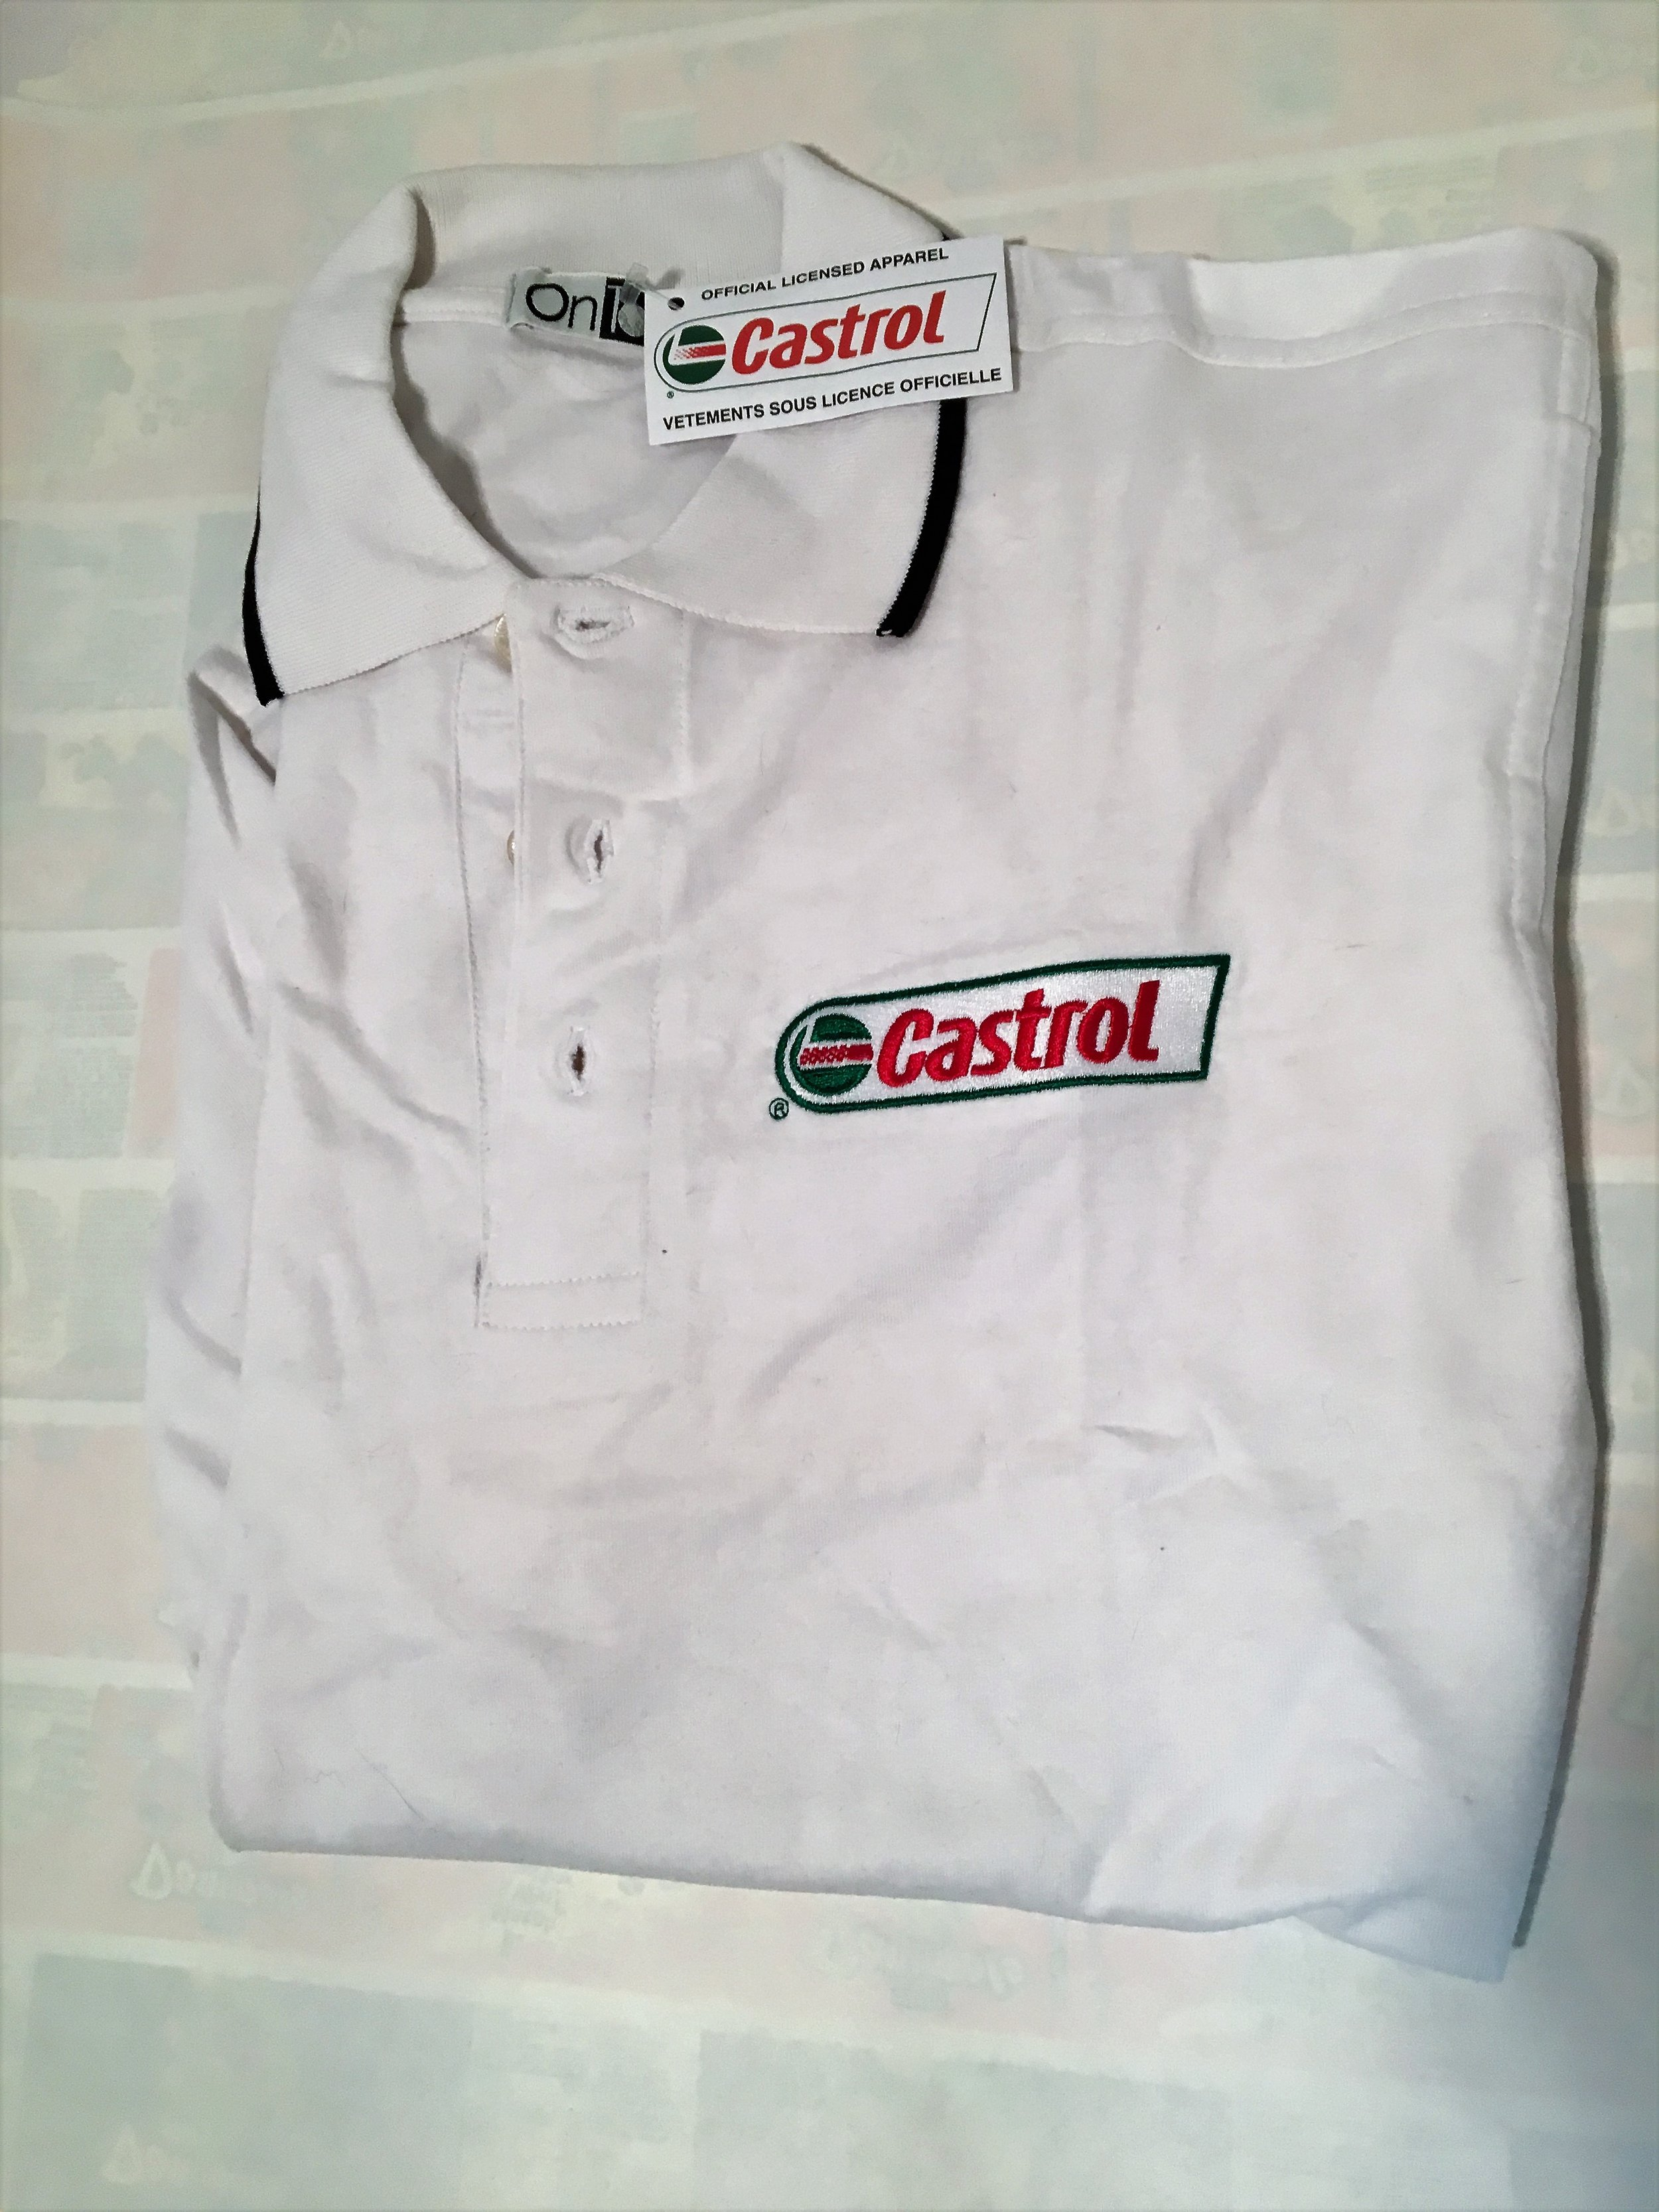 Castrol Golf Shirt $10